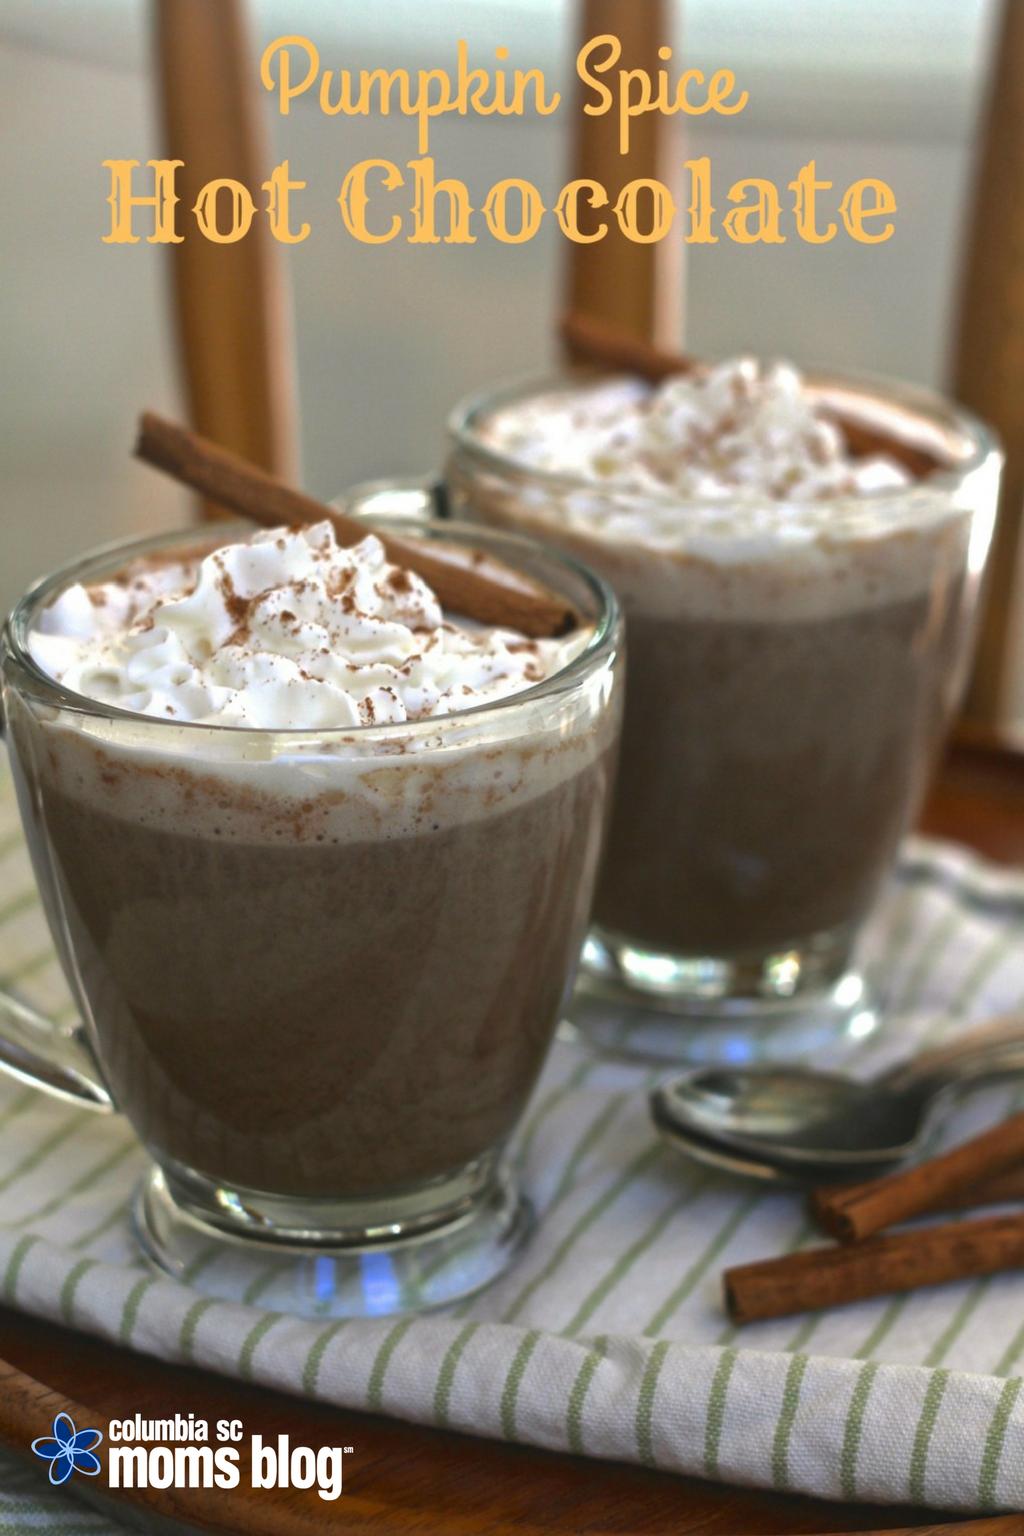 Pumpkin Spice Hot Chocolate - Columbia SC Moms Blog